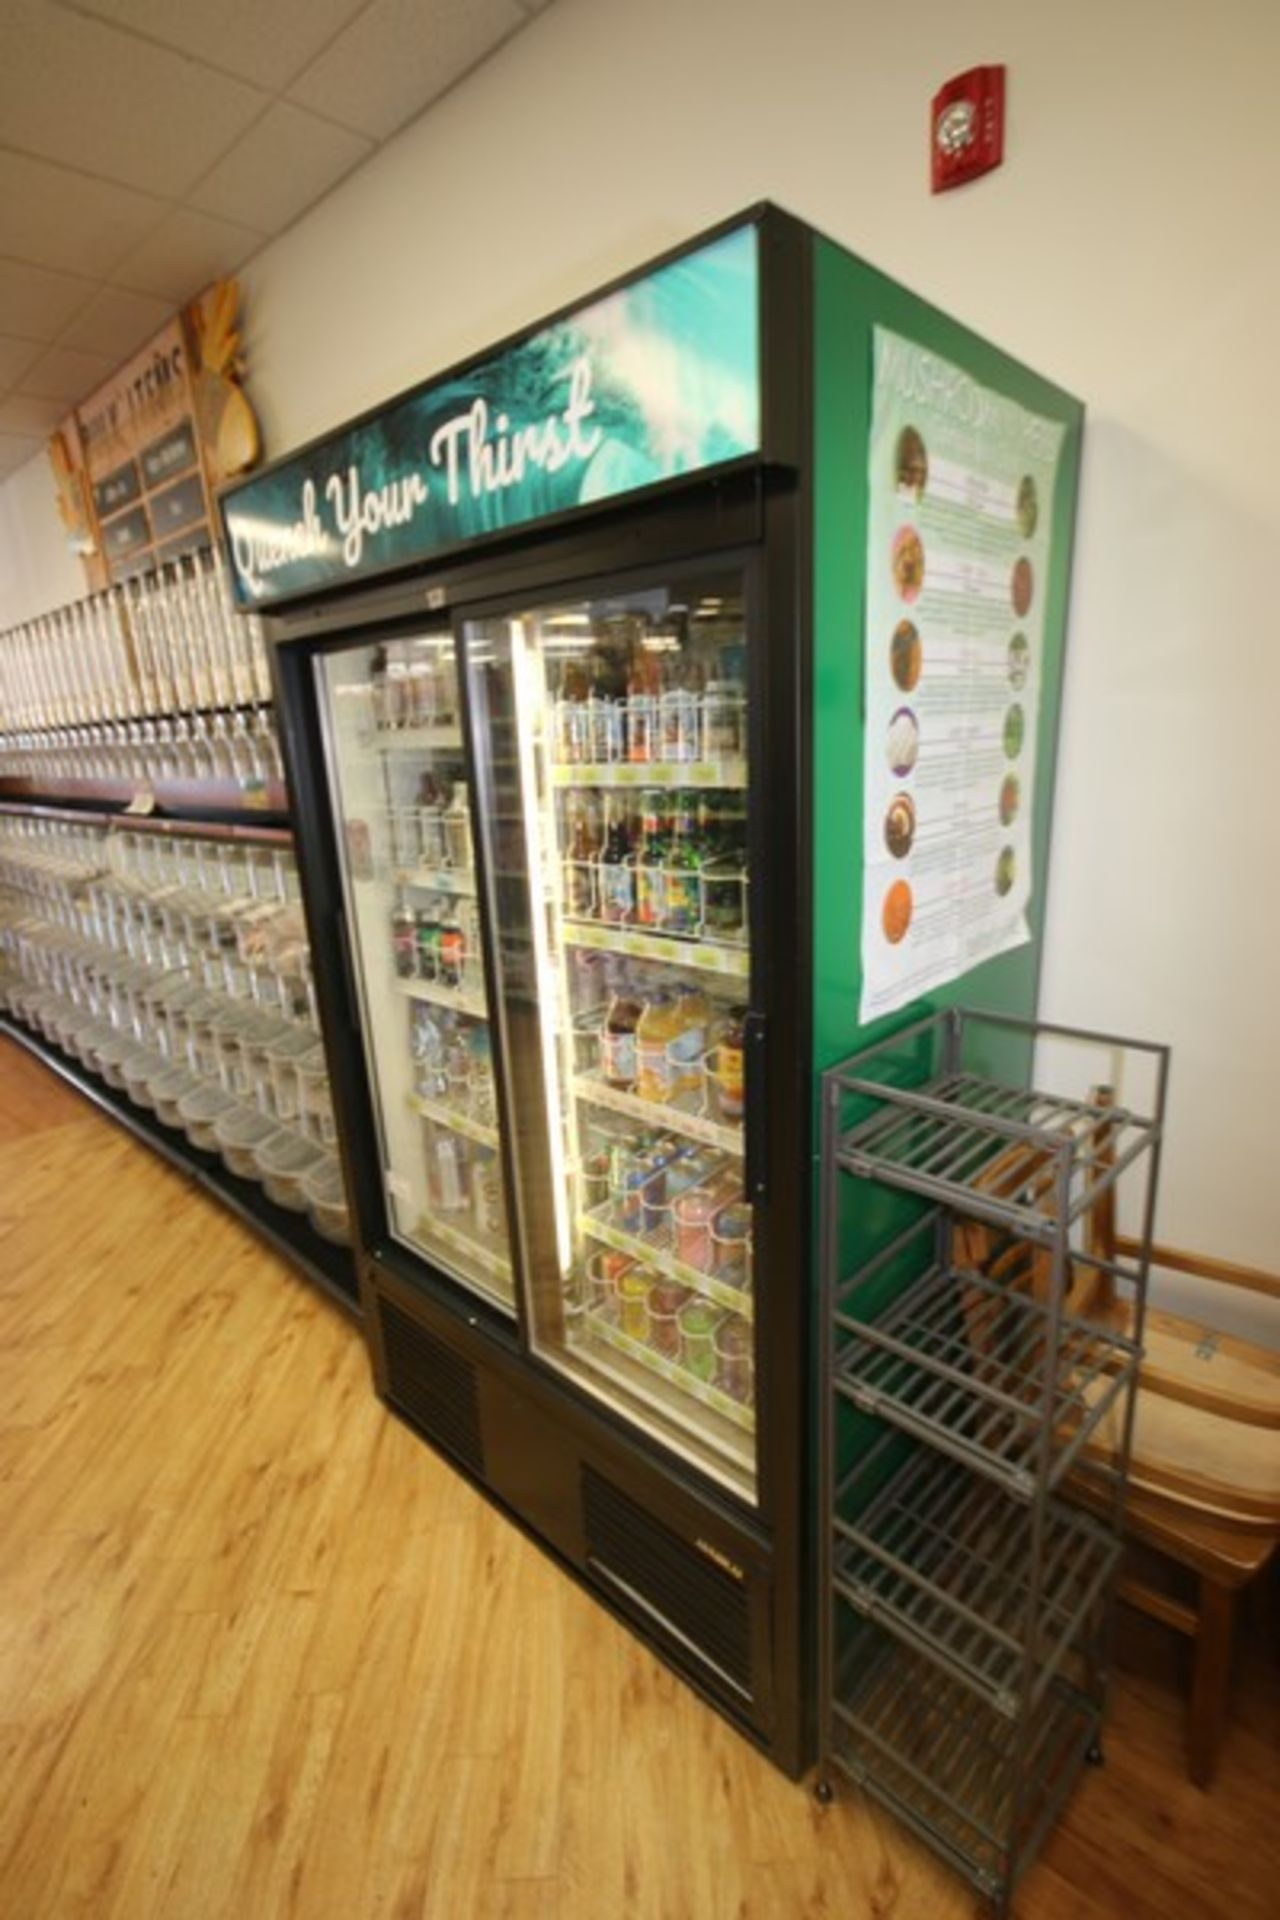 Habco Sliding Glass Refrigerator, M/N ESM42, S/N 420249330, 115 Volts, 1 Phase, Design Pressure: Low - Image 2 of 4